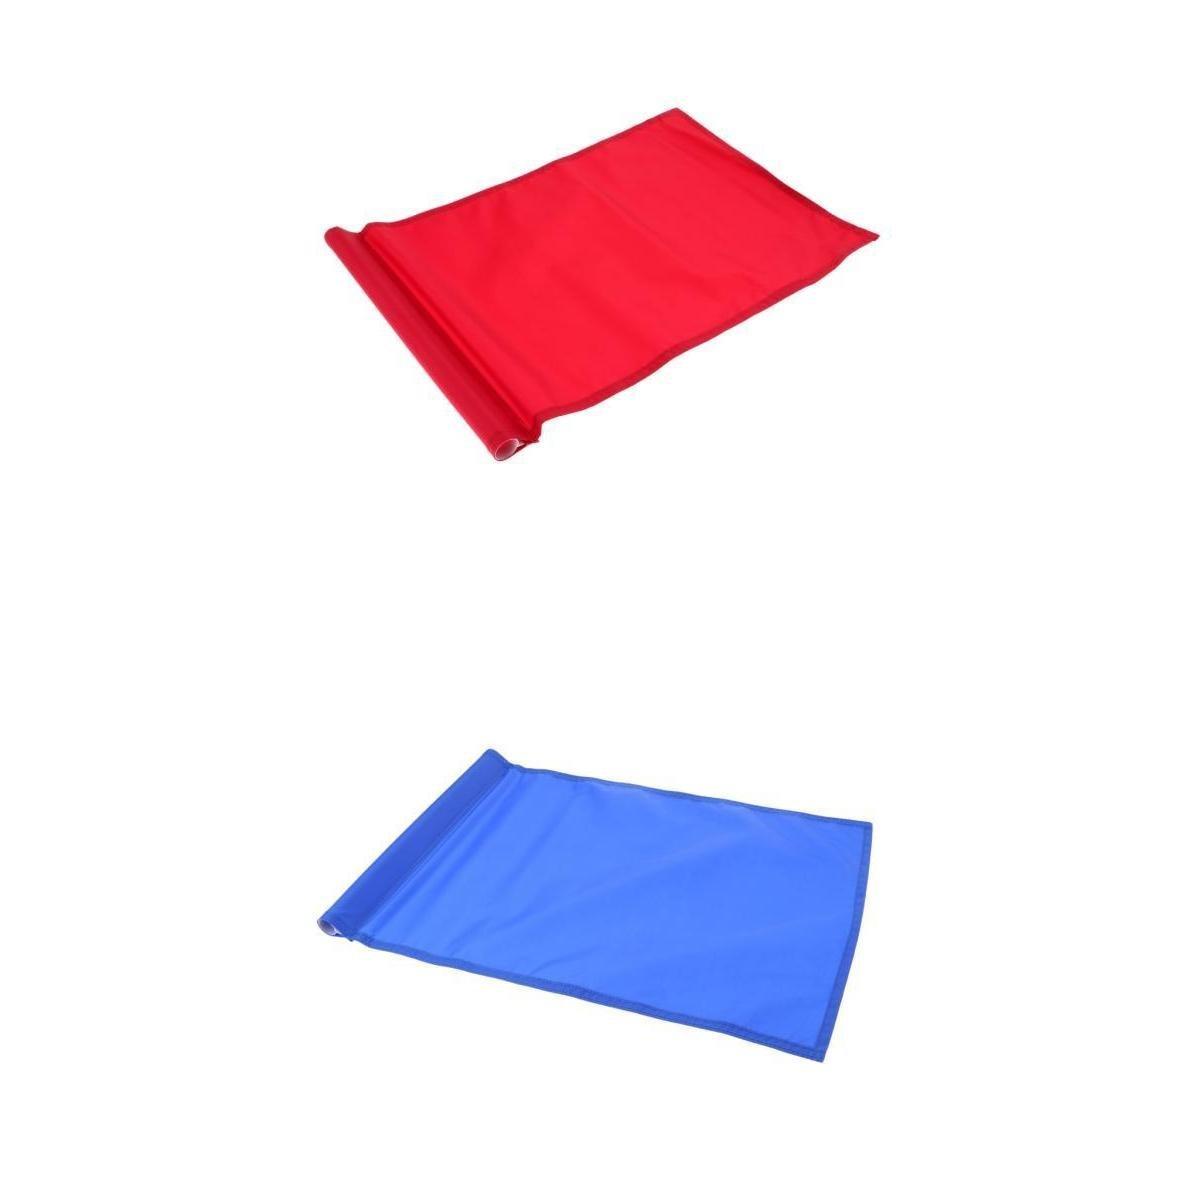 MagiDeal 2Pcs Golf Flag, Golf Putting Green Flag, Backyard Practice Golf Hole Pole Cup Flag Nylon Putting Green Flag